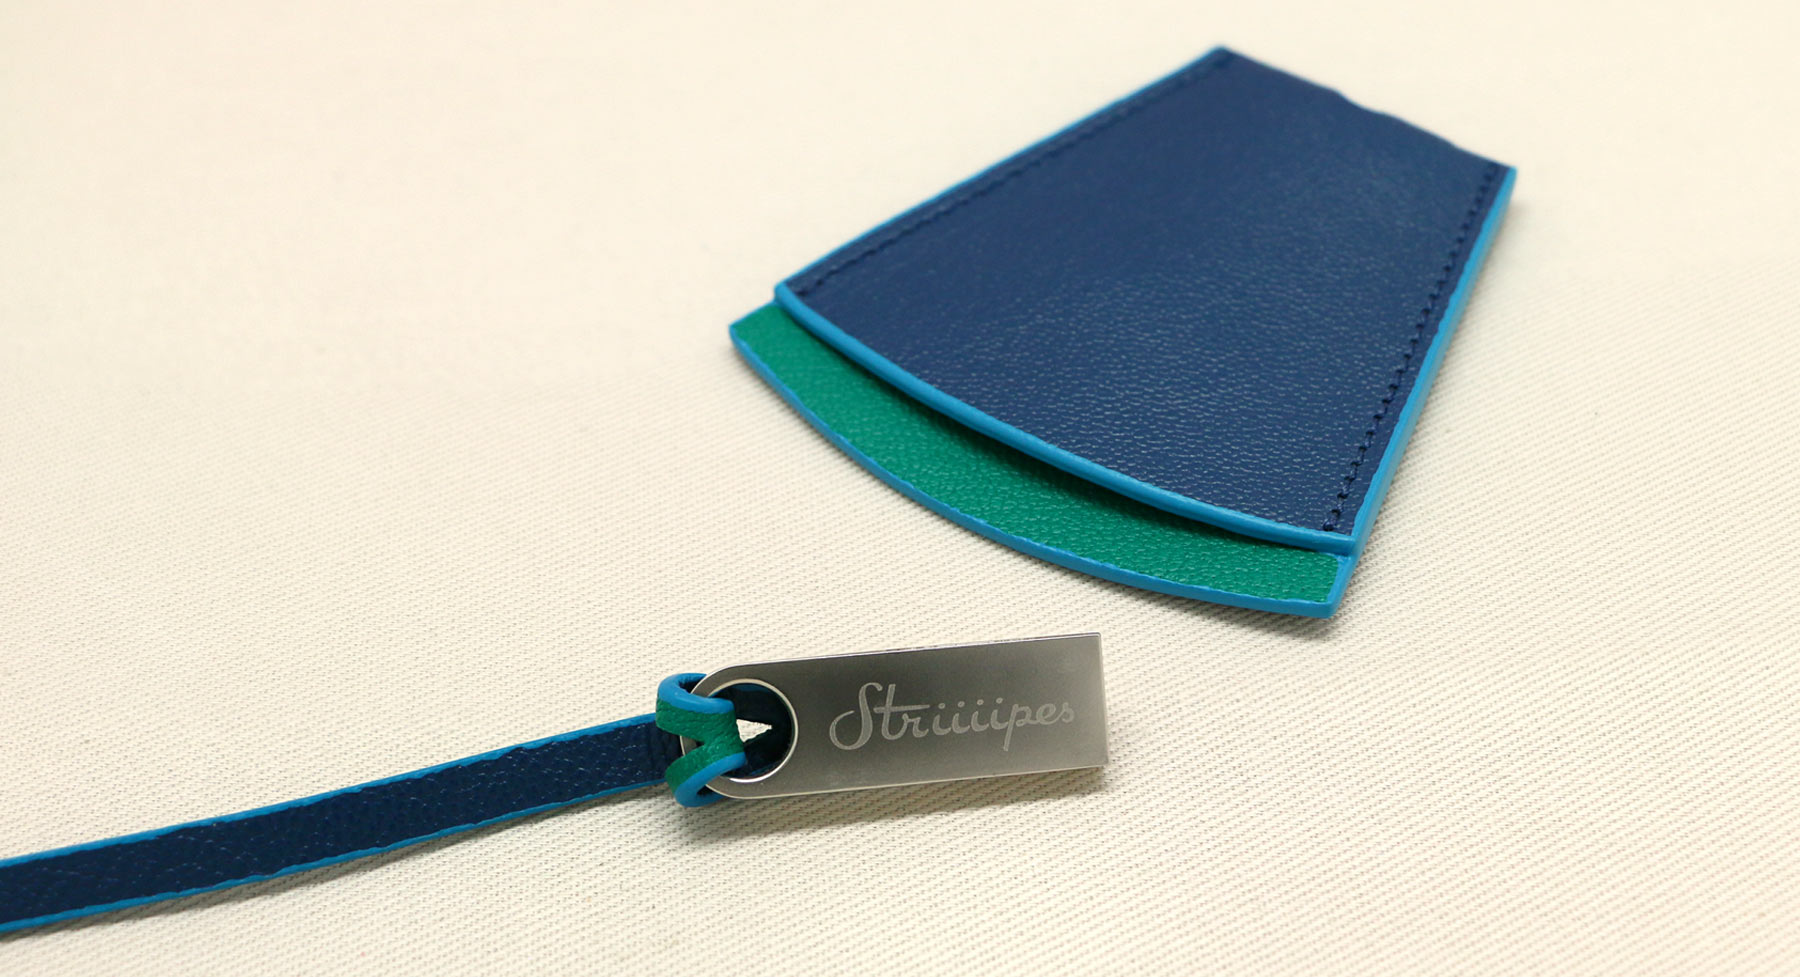 Clochette USB Holder Collection - Striiiipes